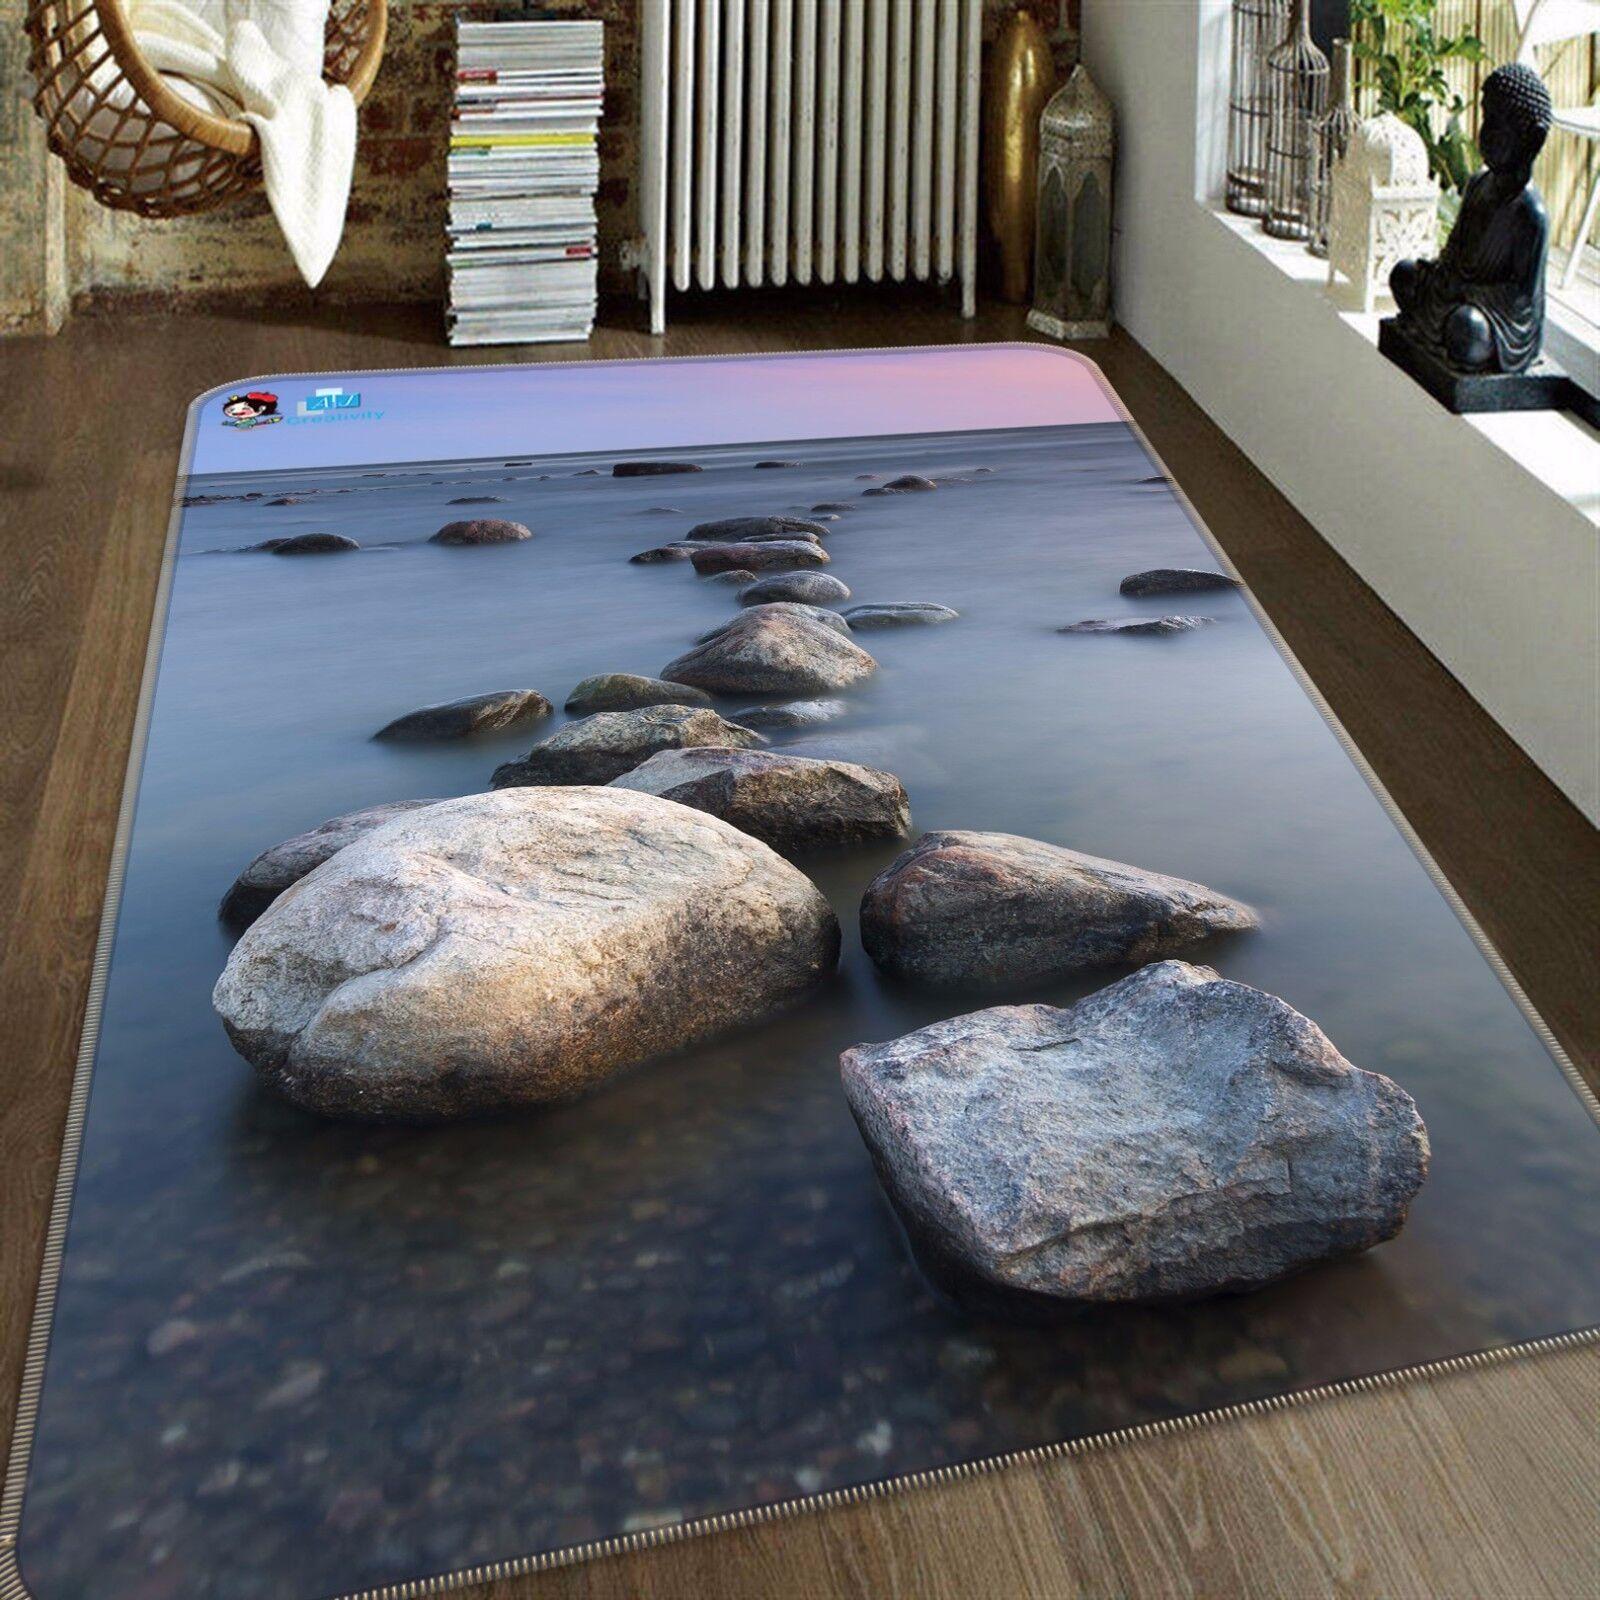 Pietra 3D View 427 tappetino antiscivolo tappeto camera Tappetino Qualità Elegante foto Tappeto UK